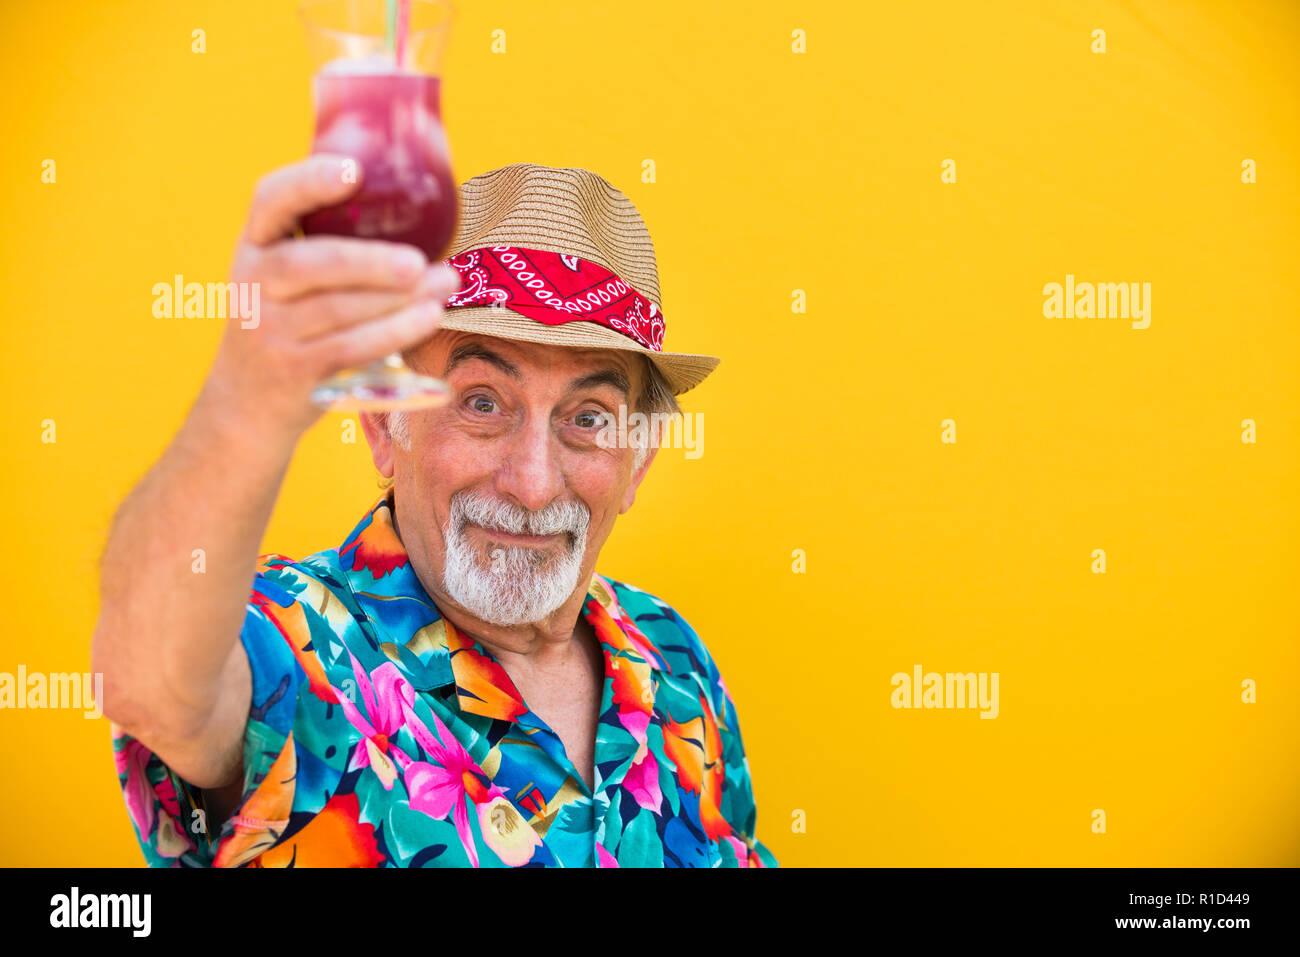 Mann lustig alter Geburtstag Lustig